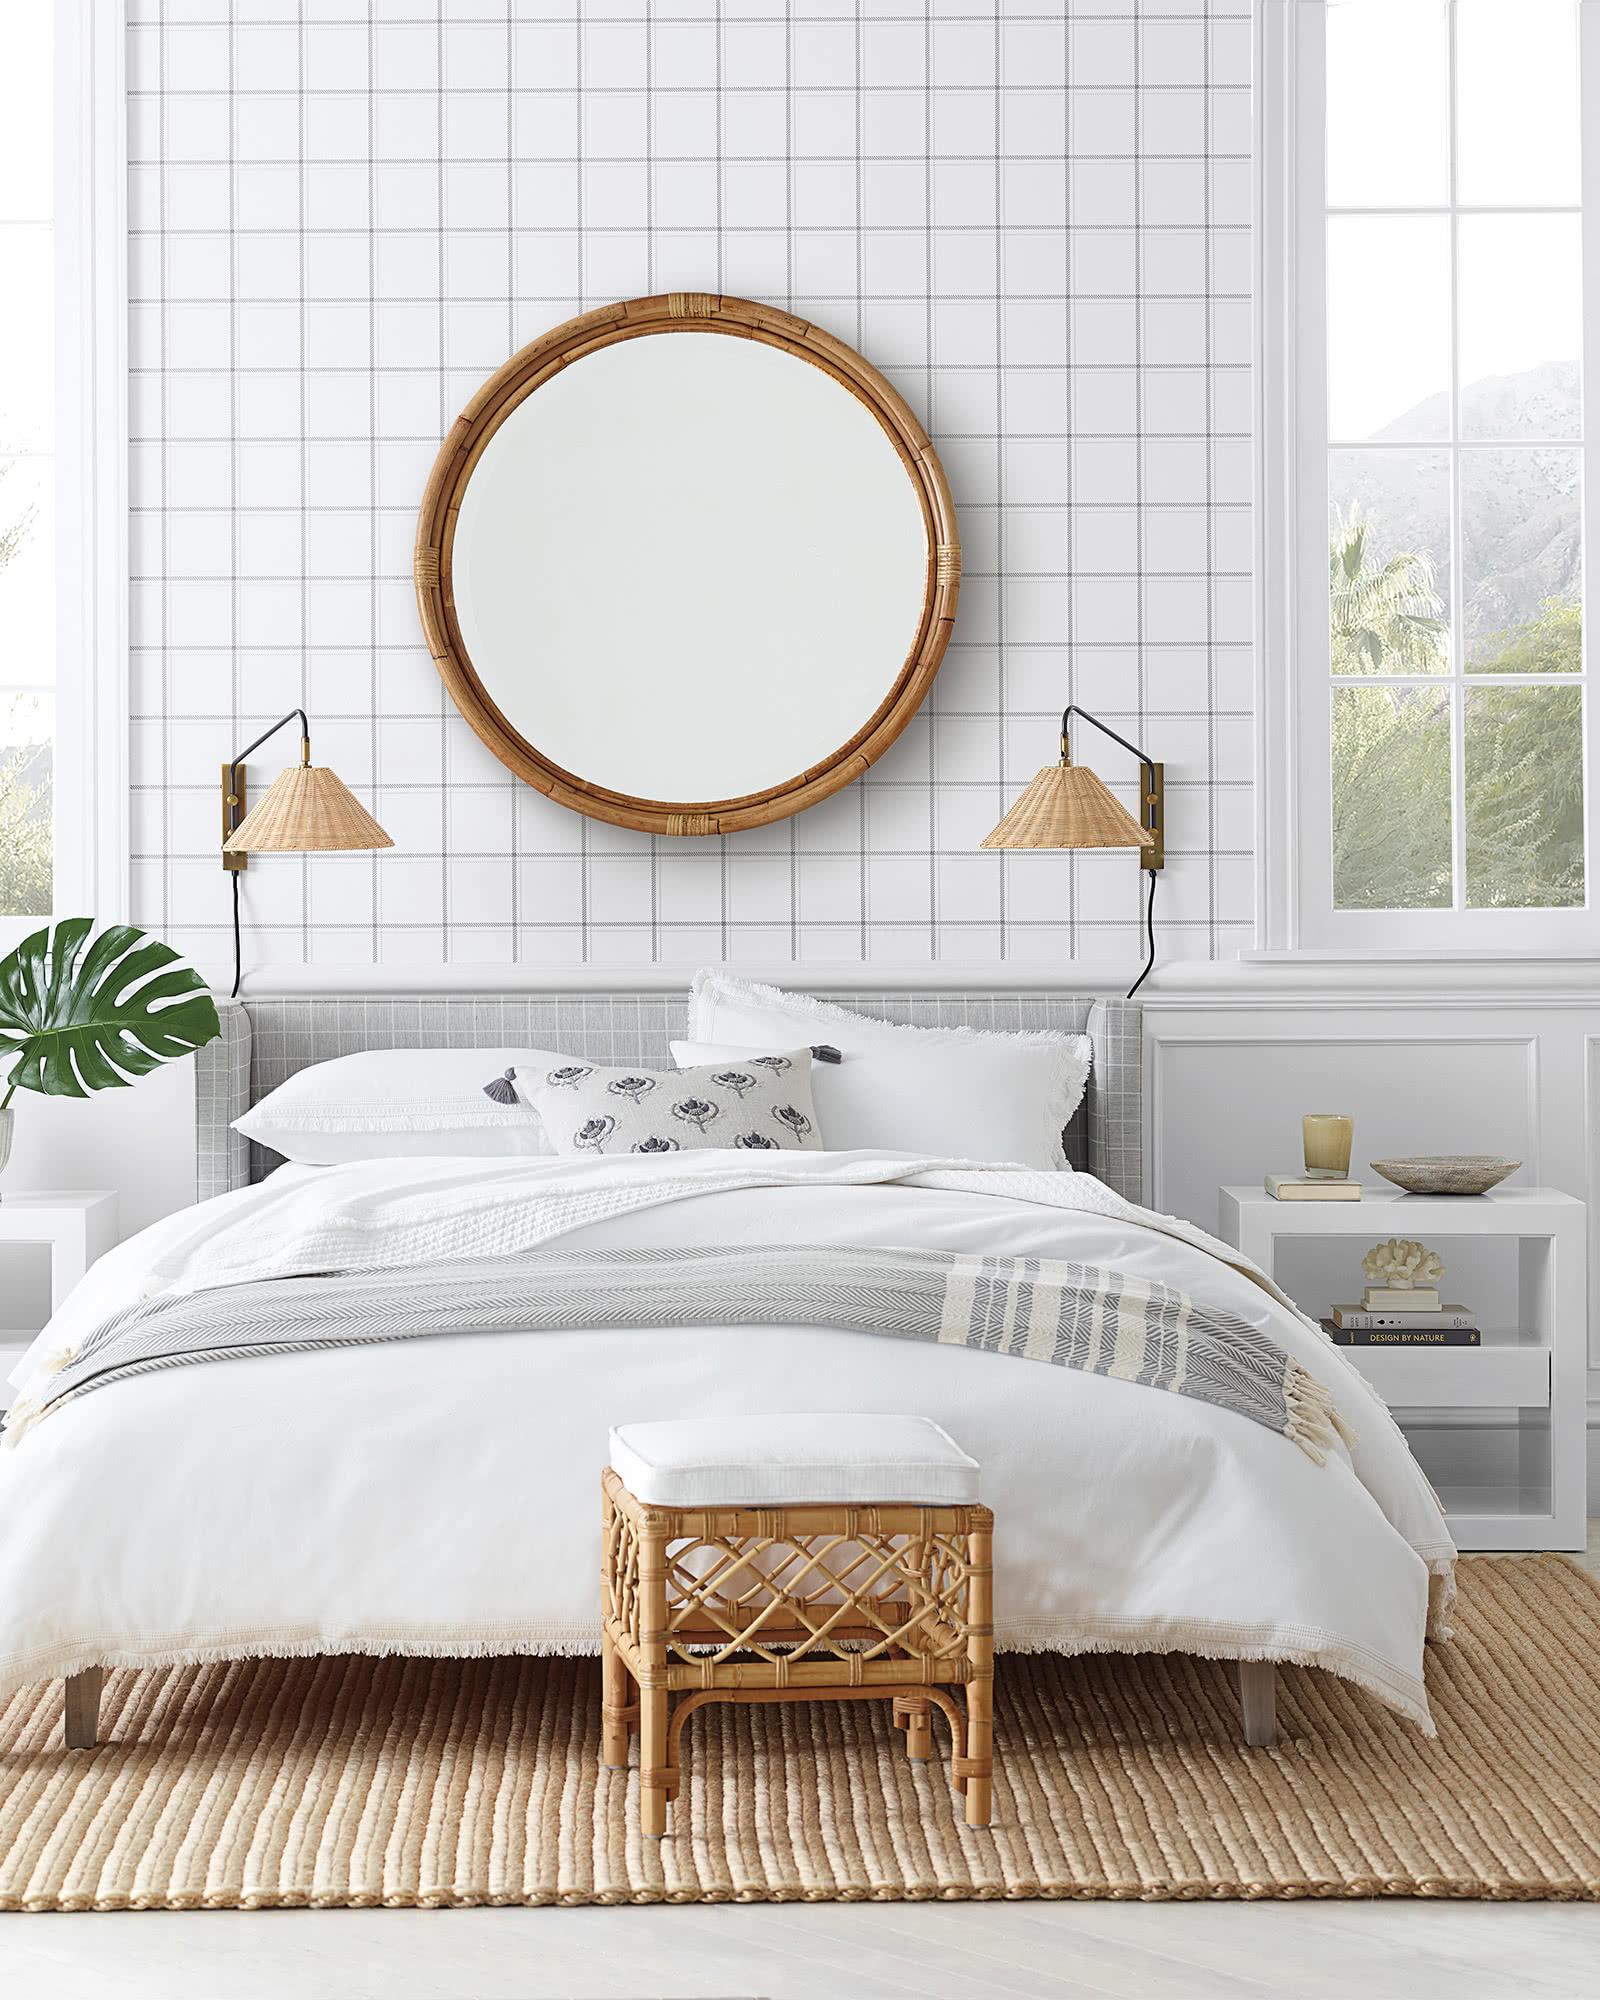 Rattan Sconce in Coastal Modern Bedroom.jpg